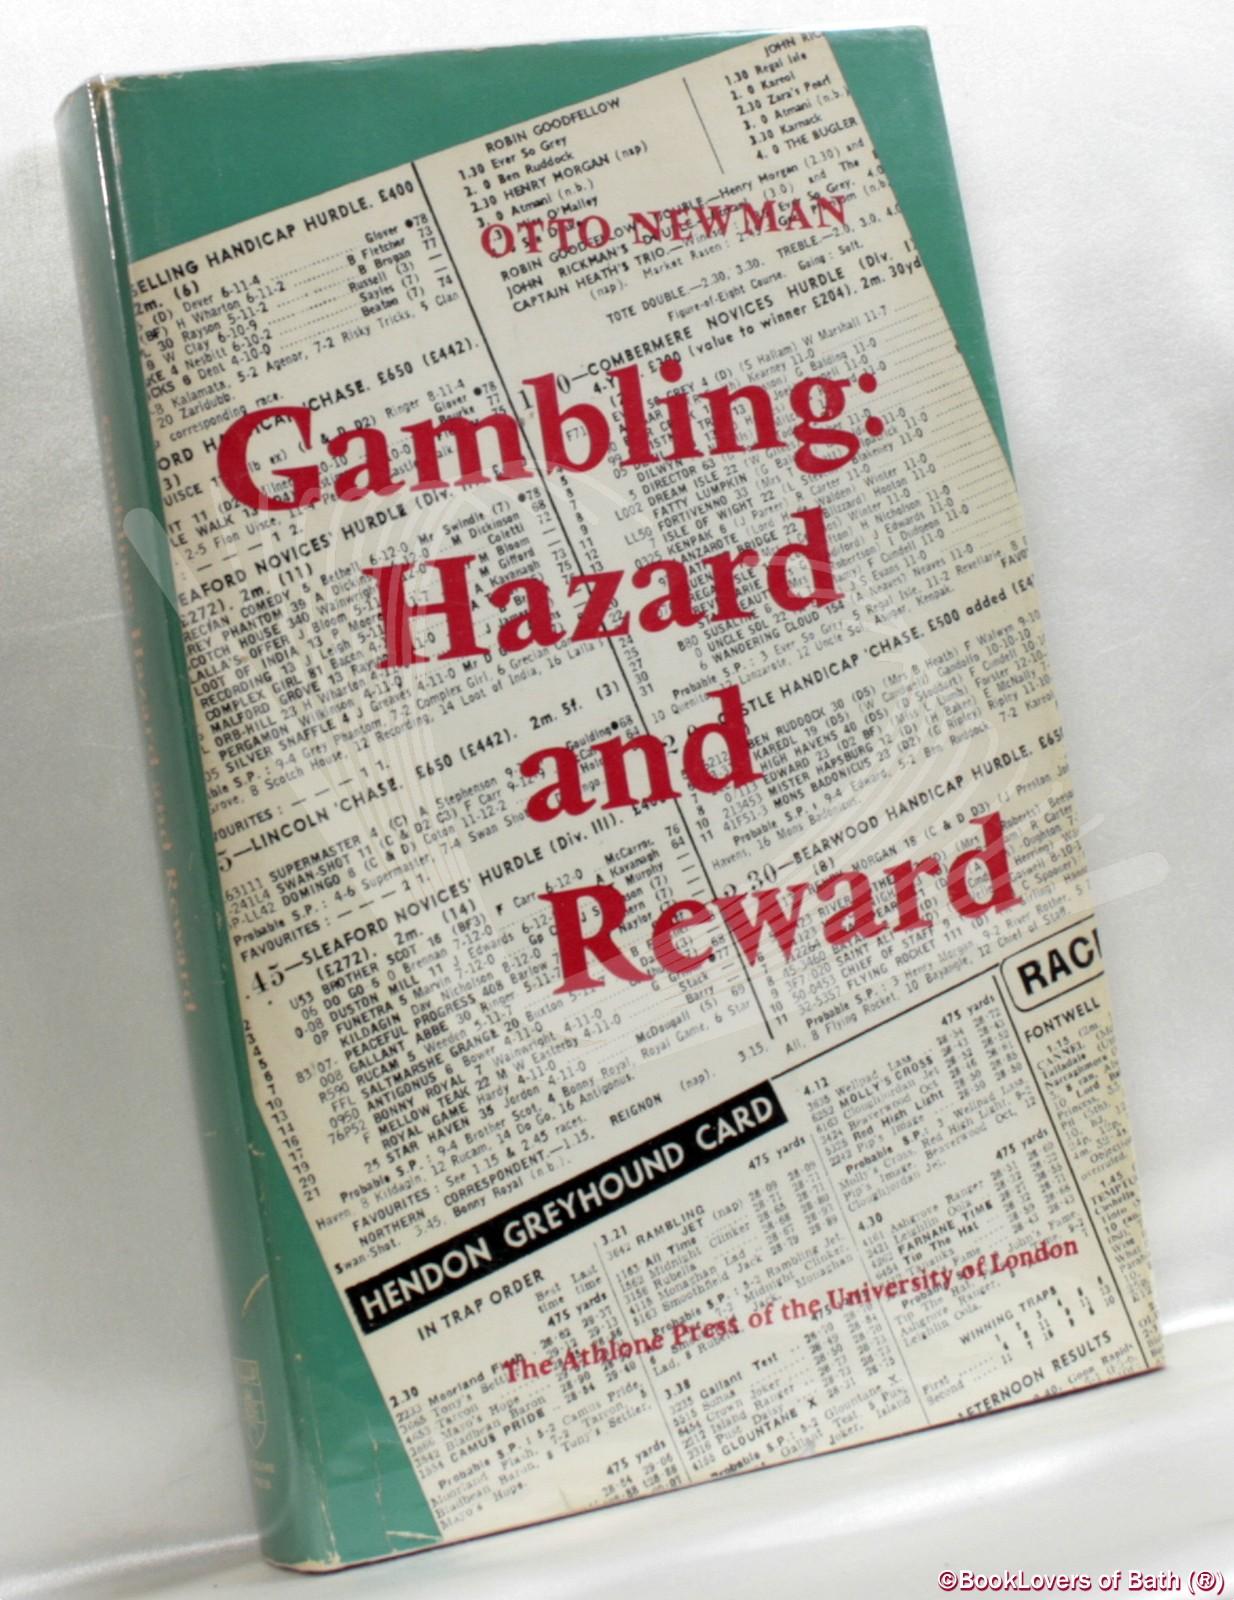 Gambling hazard and reward by otto newman